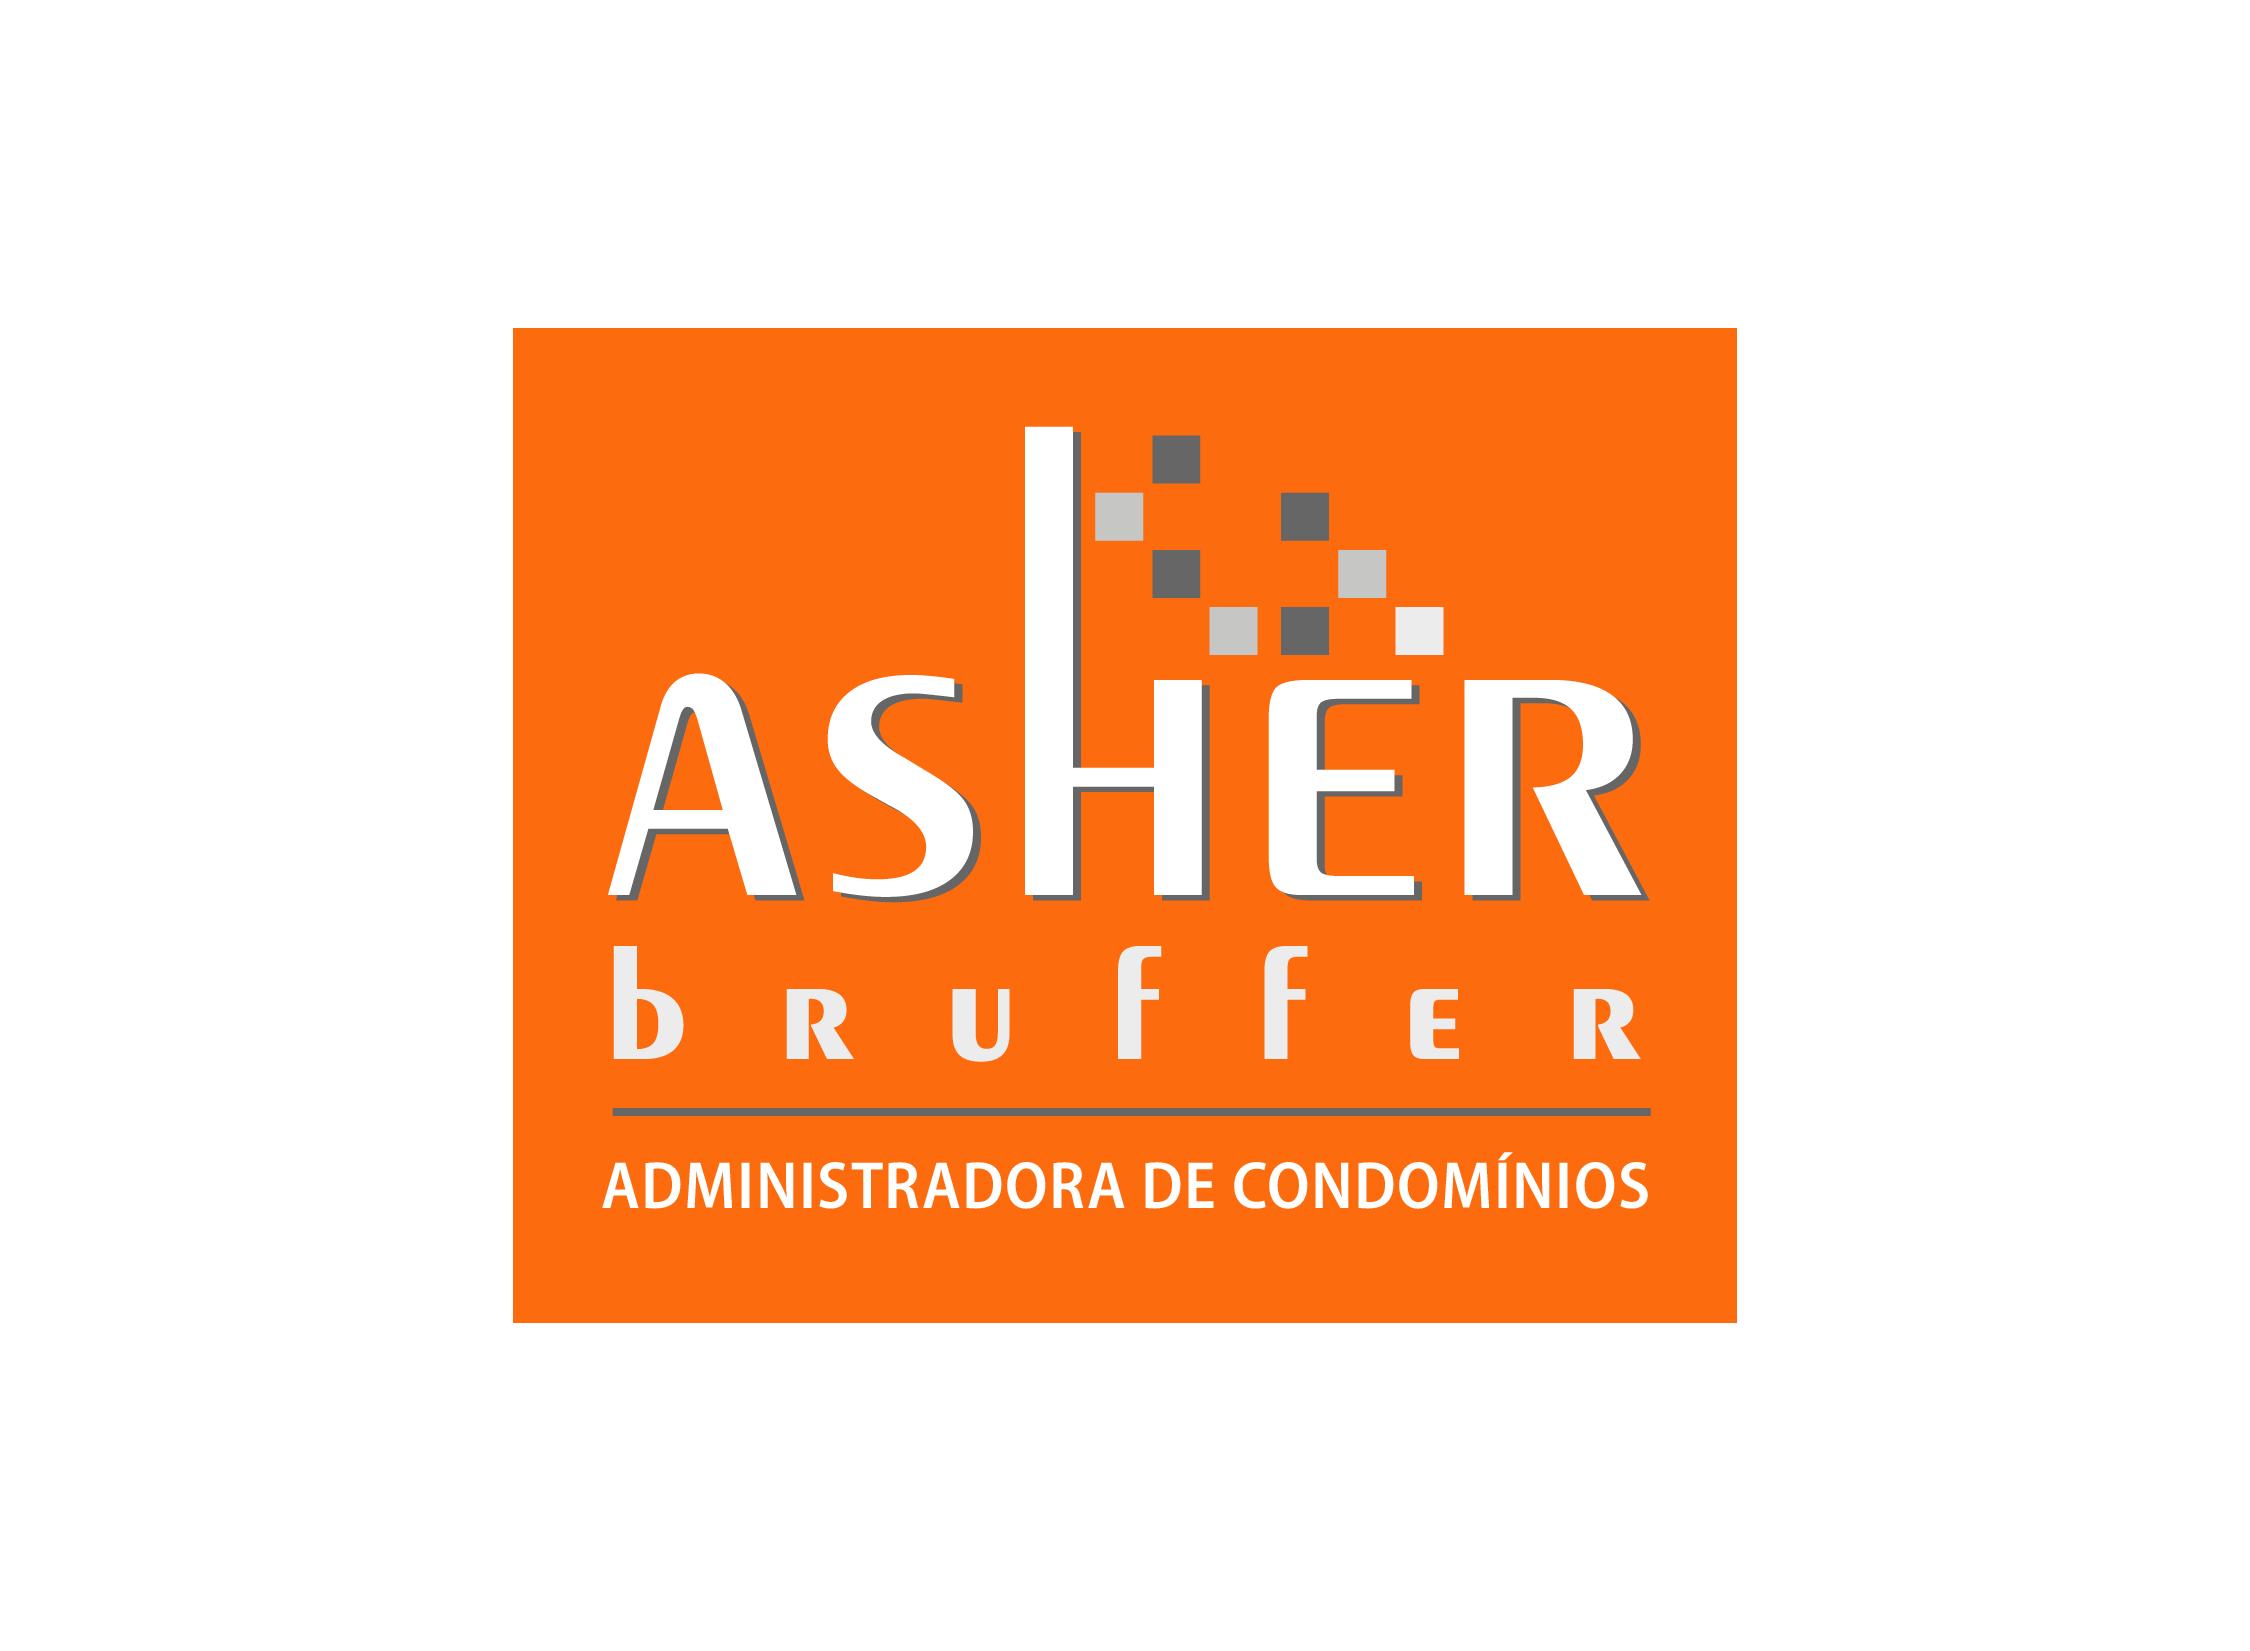 asher_bruffer_novo_logo_03_institucional_vertical